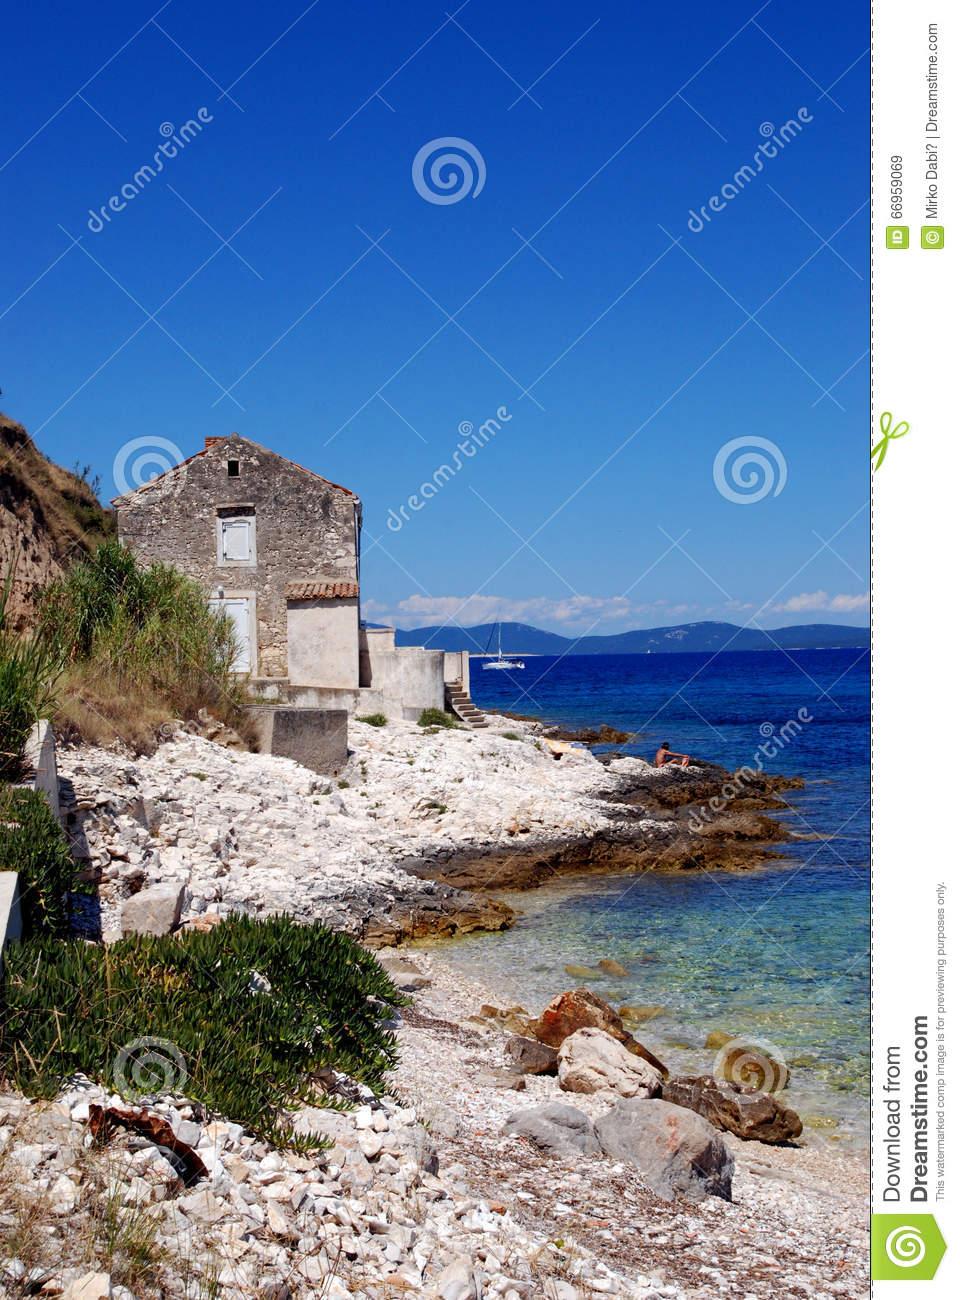 Fisherman's House At The Rocky Stone Beach In Island Susak,Croatia.